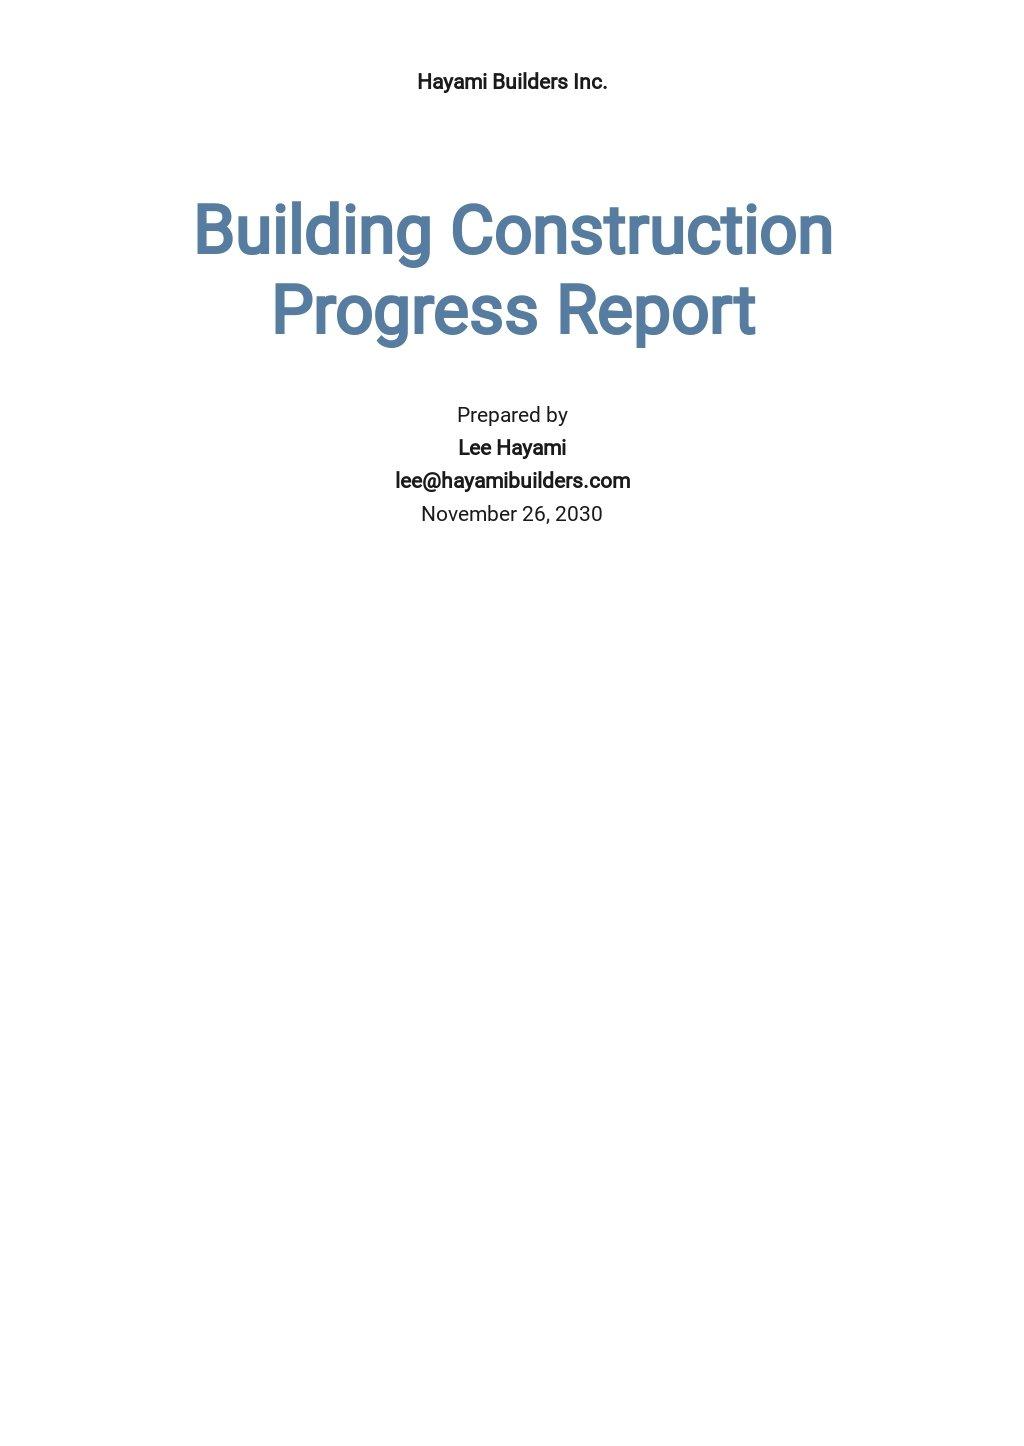 Building Construction Progress Report Template.jpe